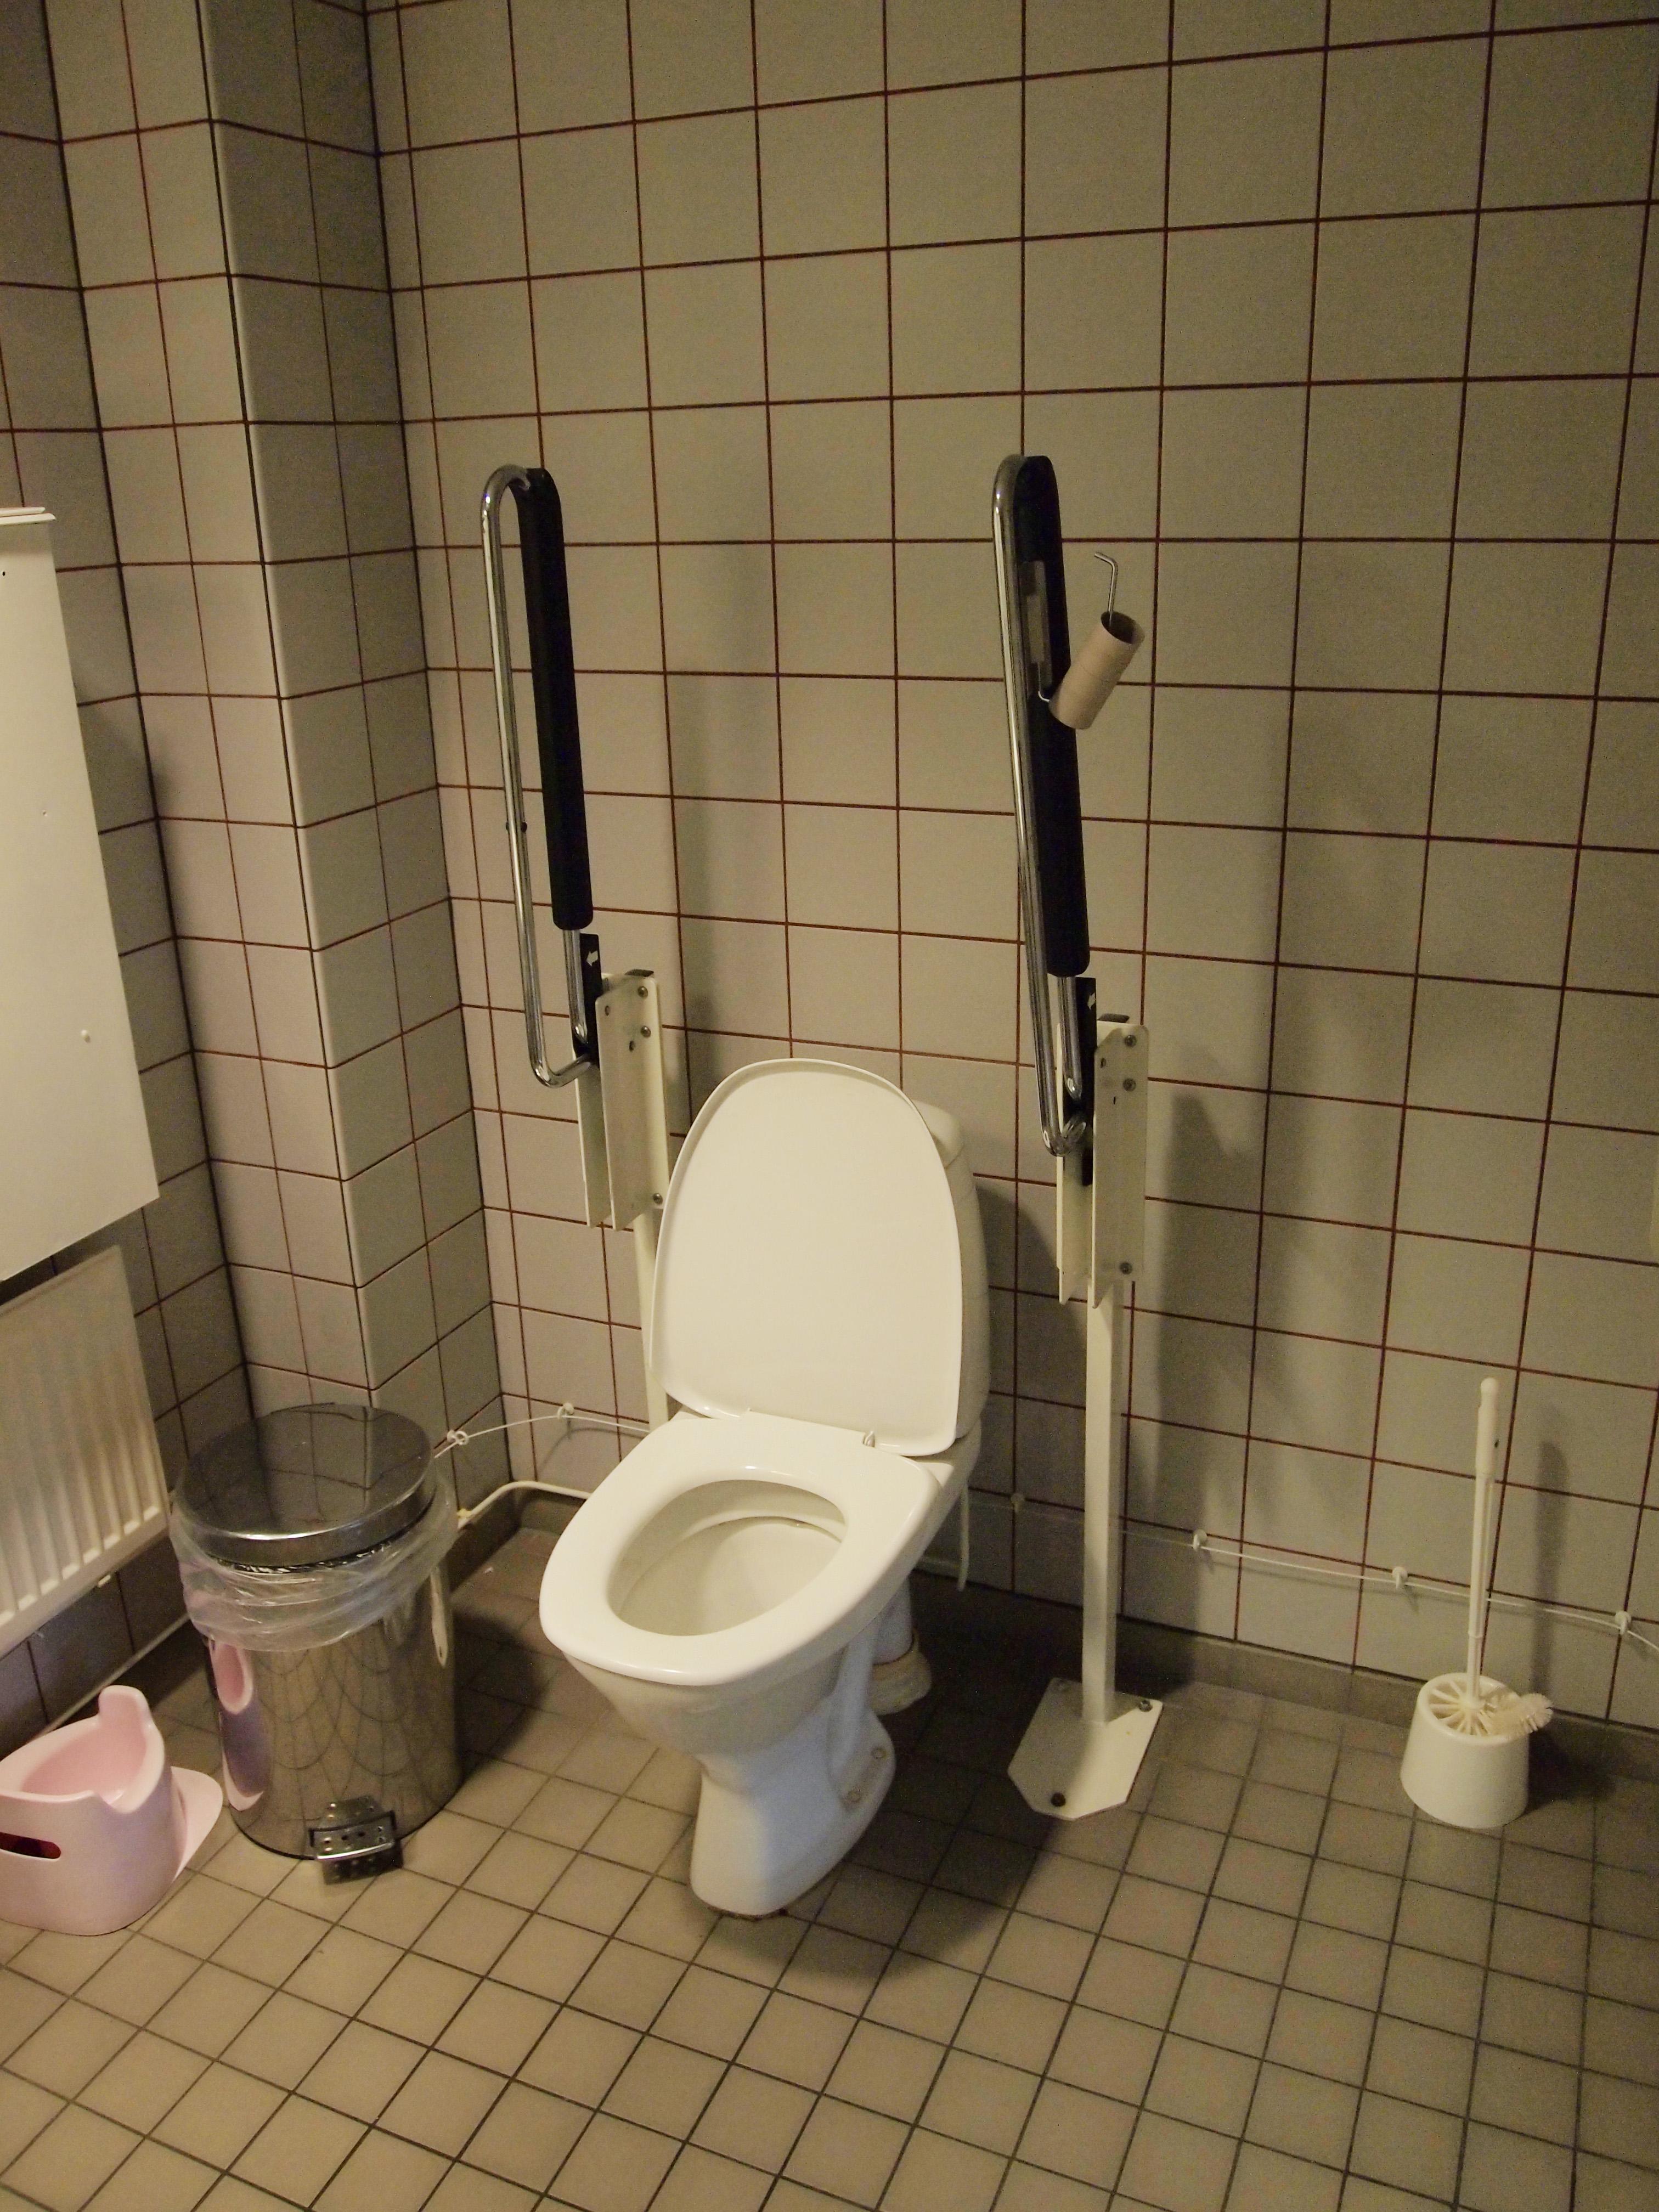 File:Handicap toilet.jpg - Wikimedia Commons